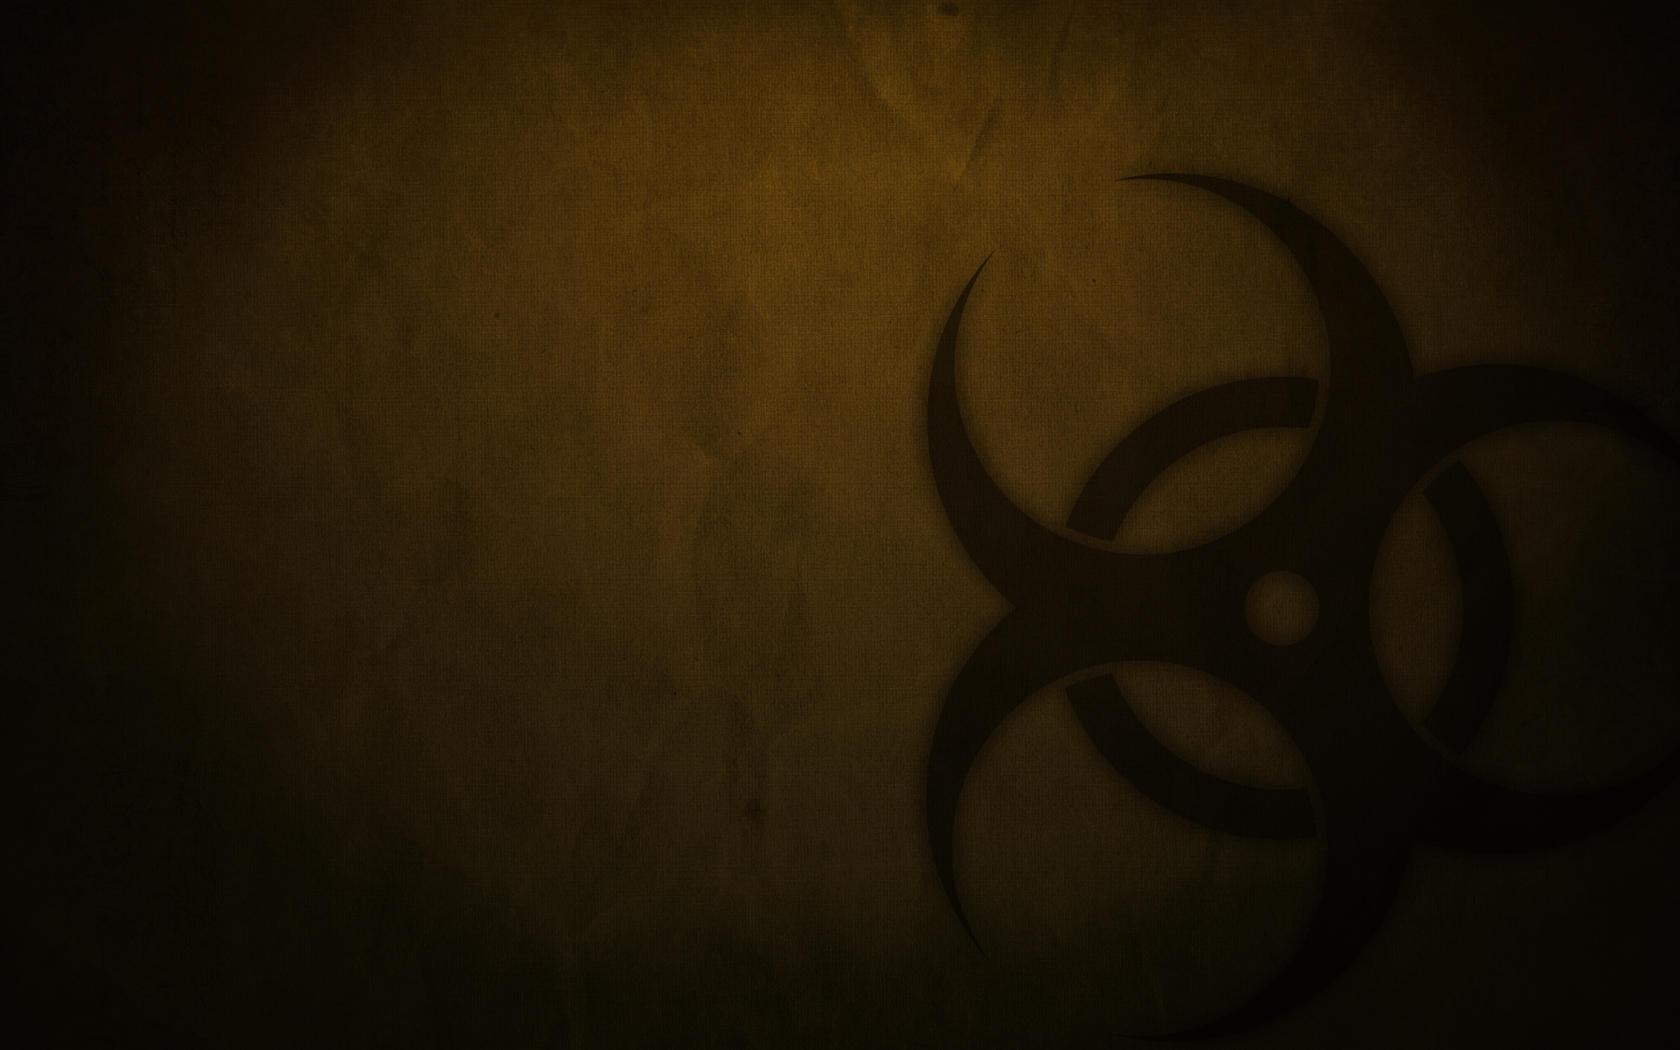 Kyle Wallpapers. [WARNING - HUGE PICS] Grunge_Biohazard_Wallpaper__by_grazx